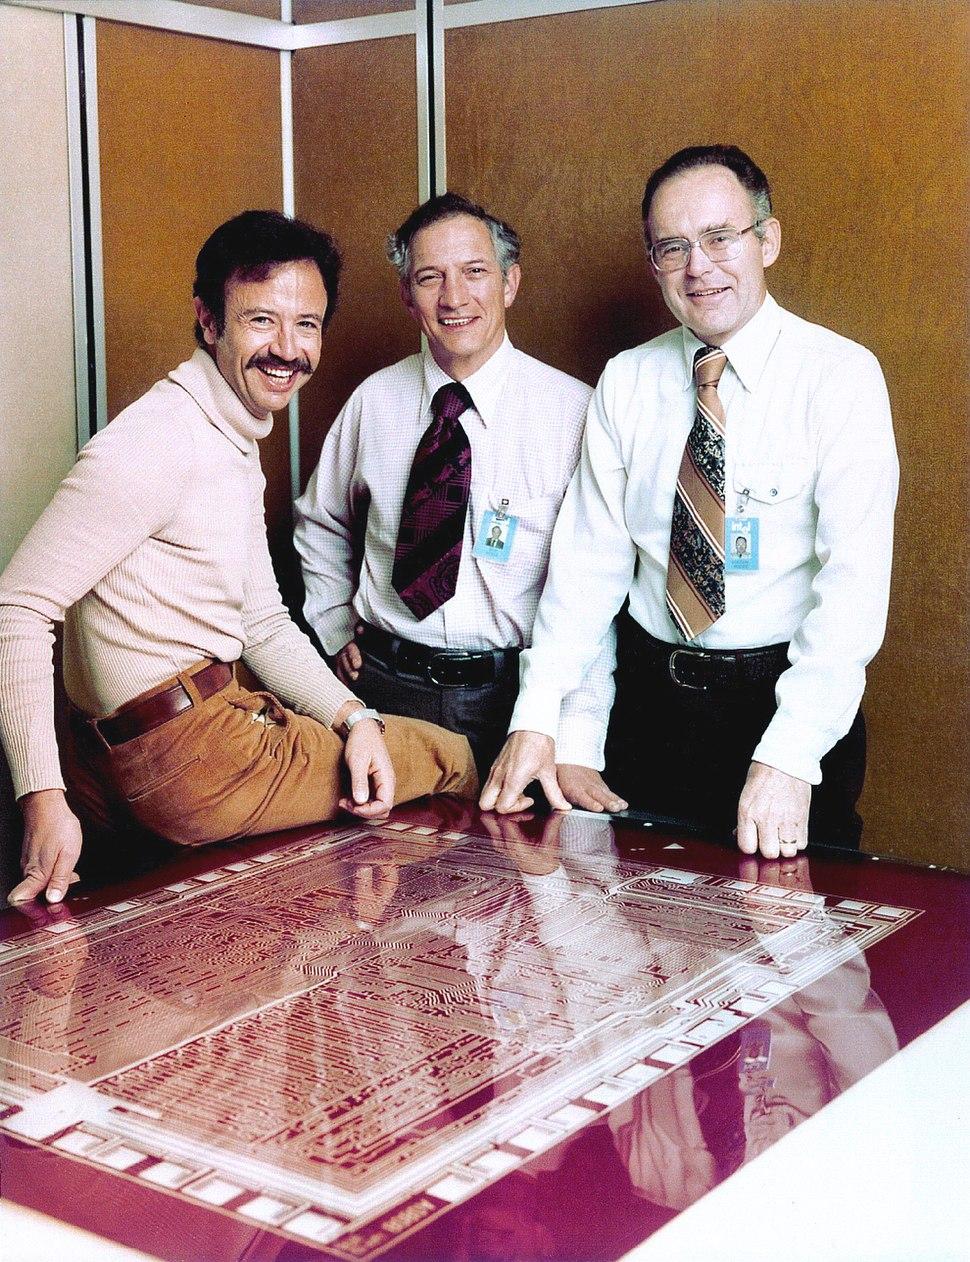 Andy Grove Robert Noyce Gordon Moore 1978 edit